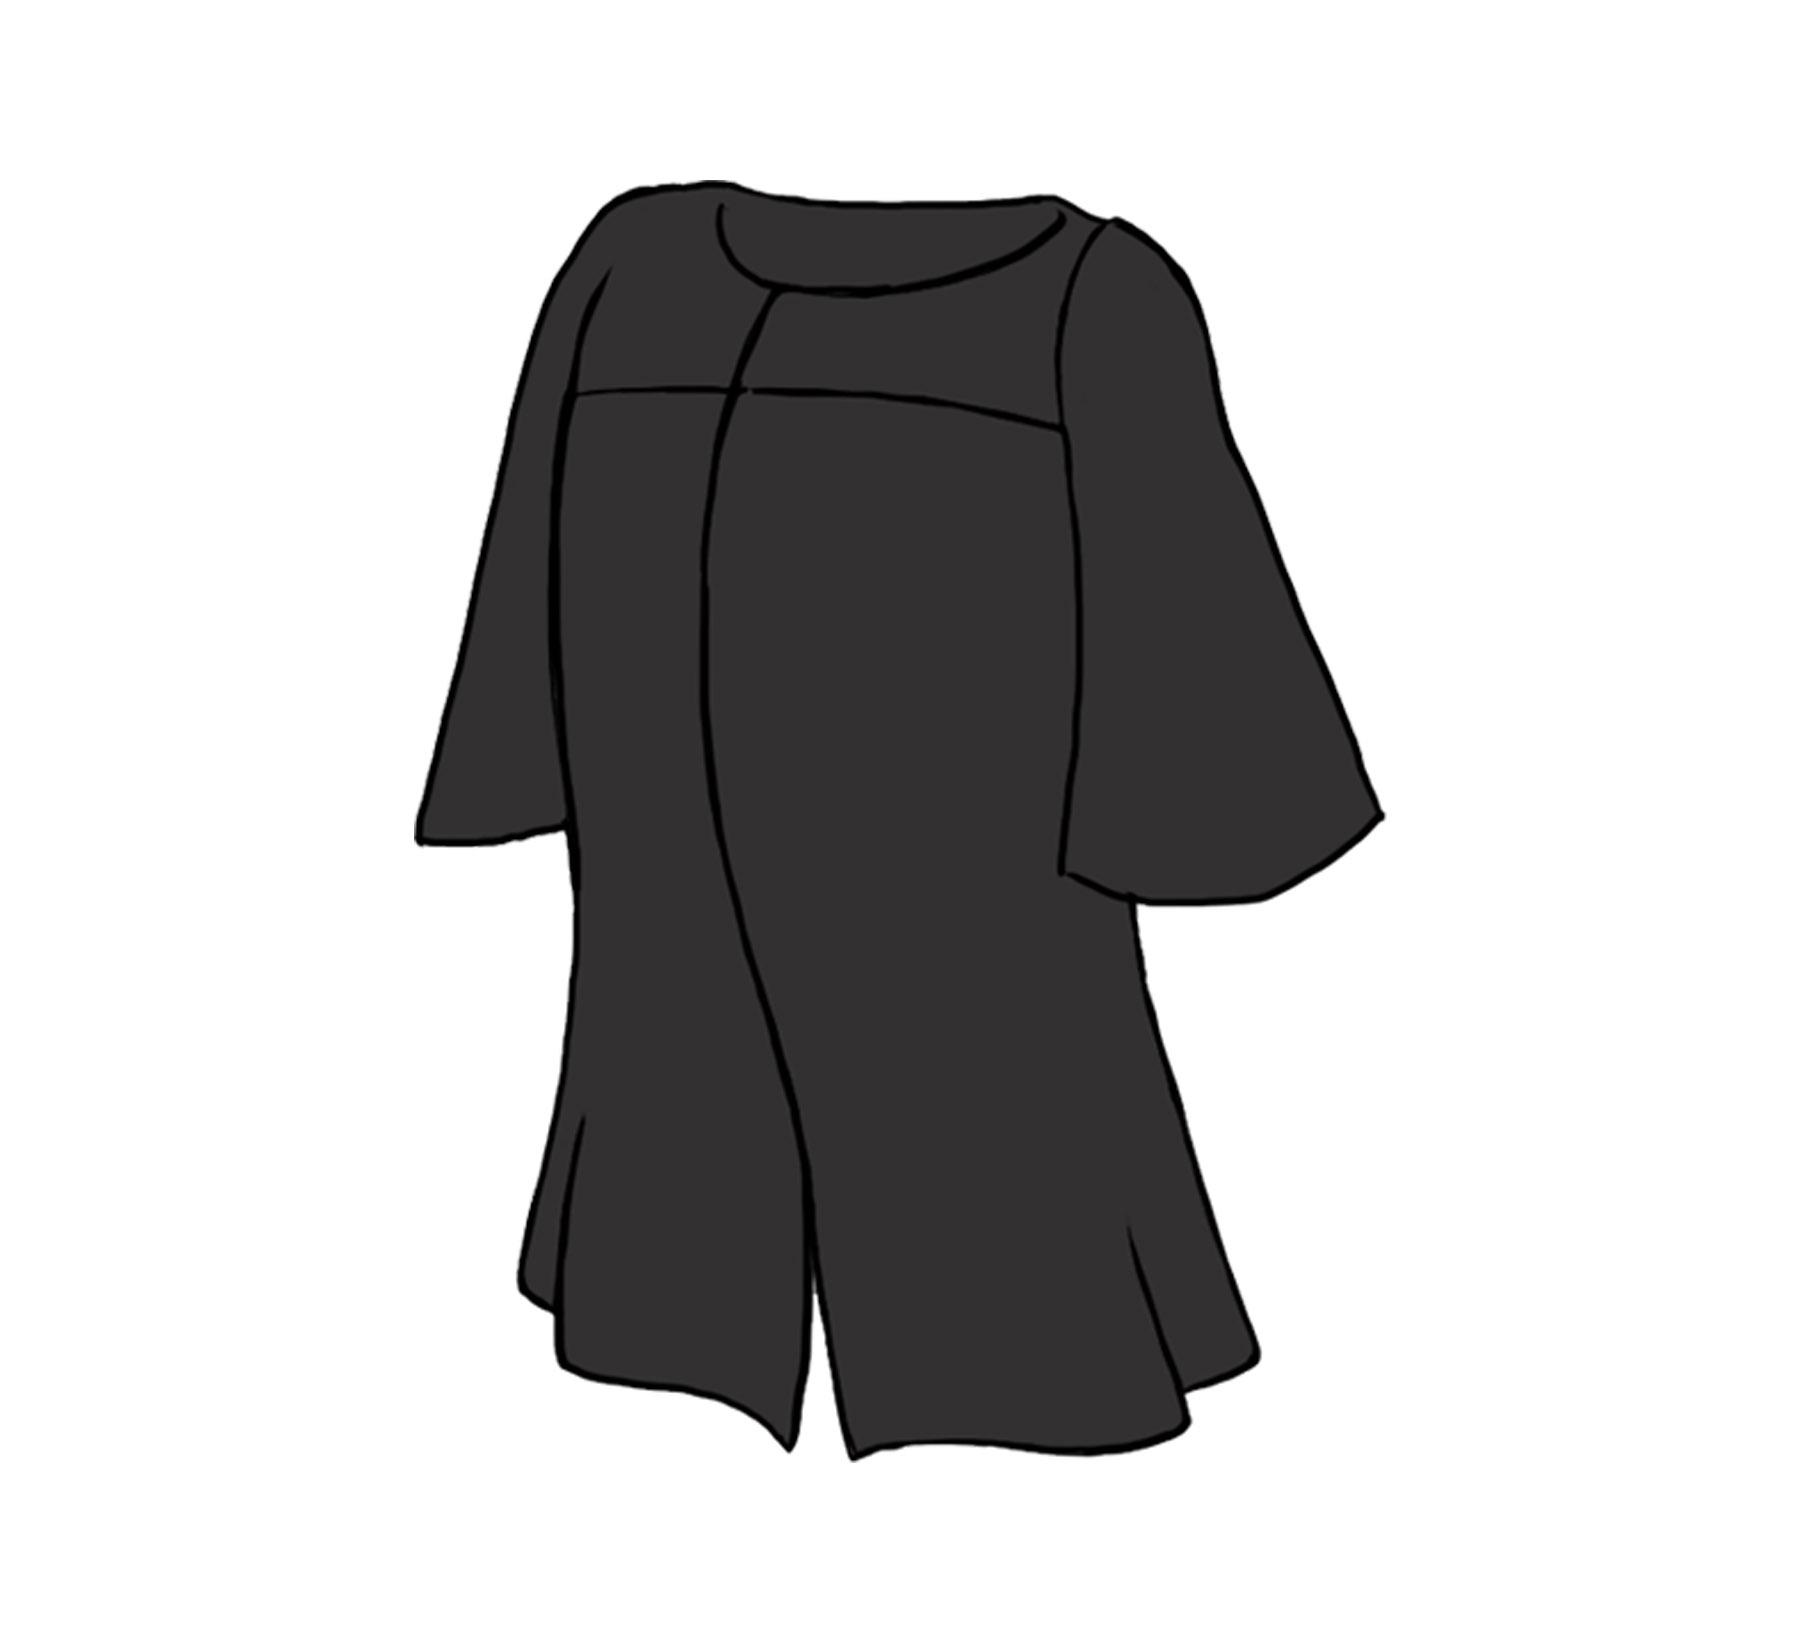 Graduation Gown - Mascots